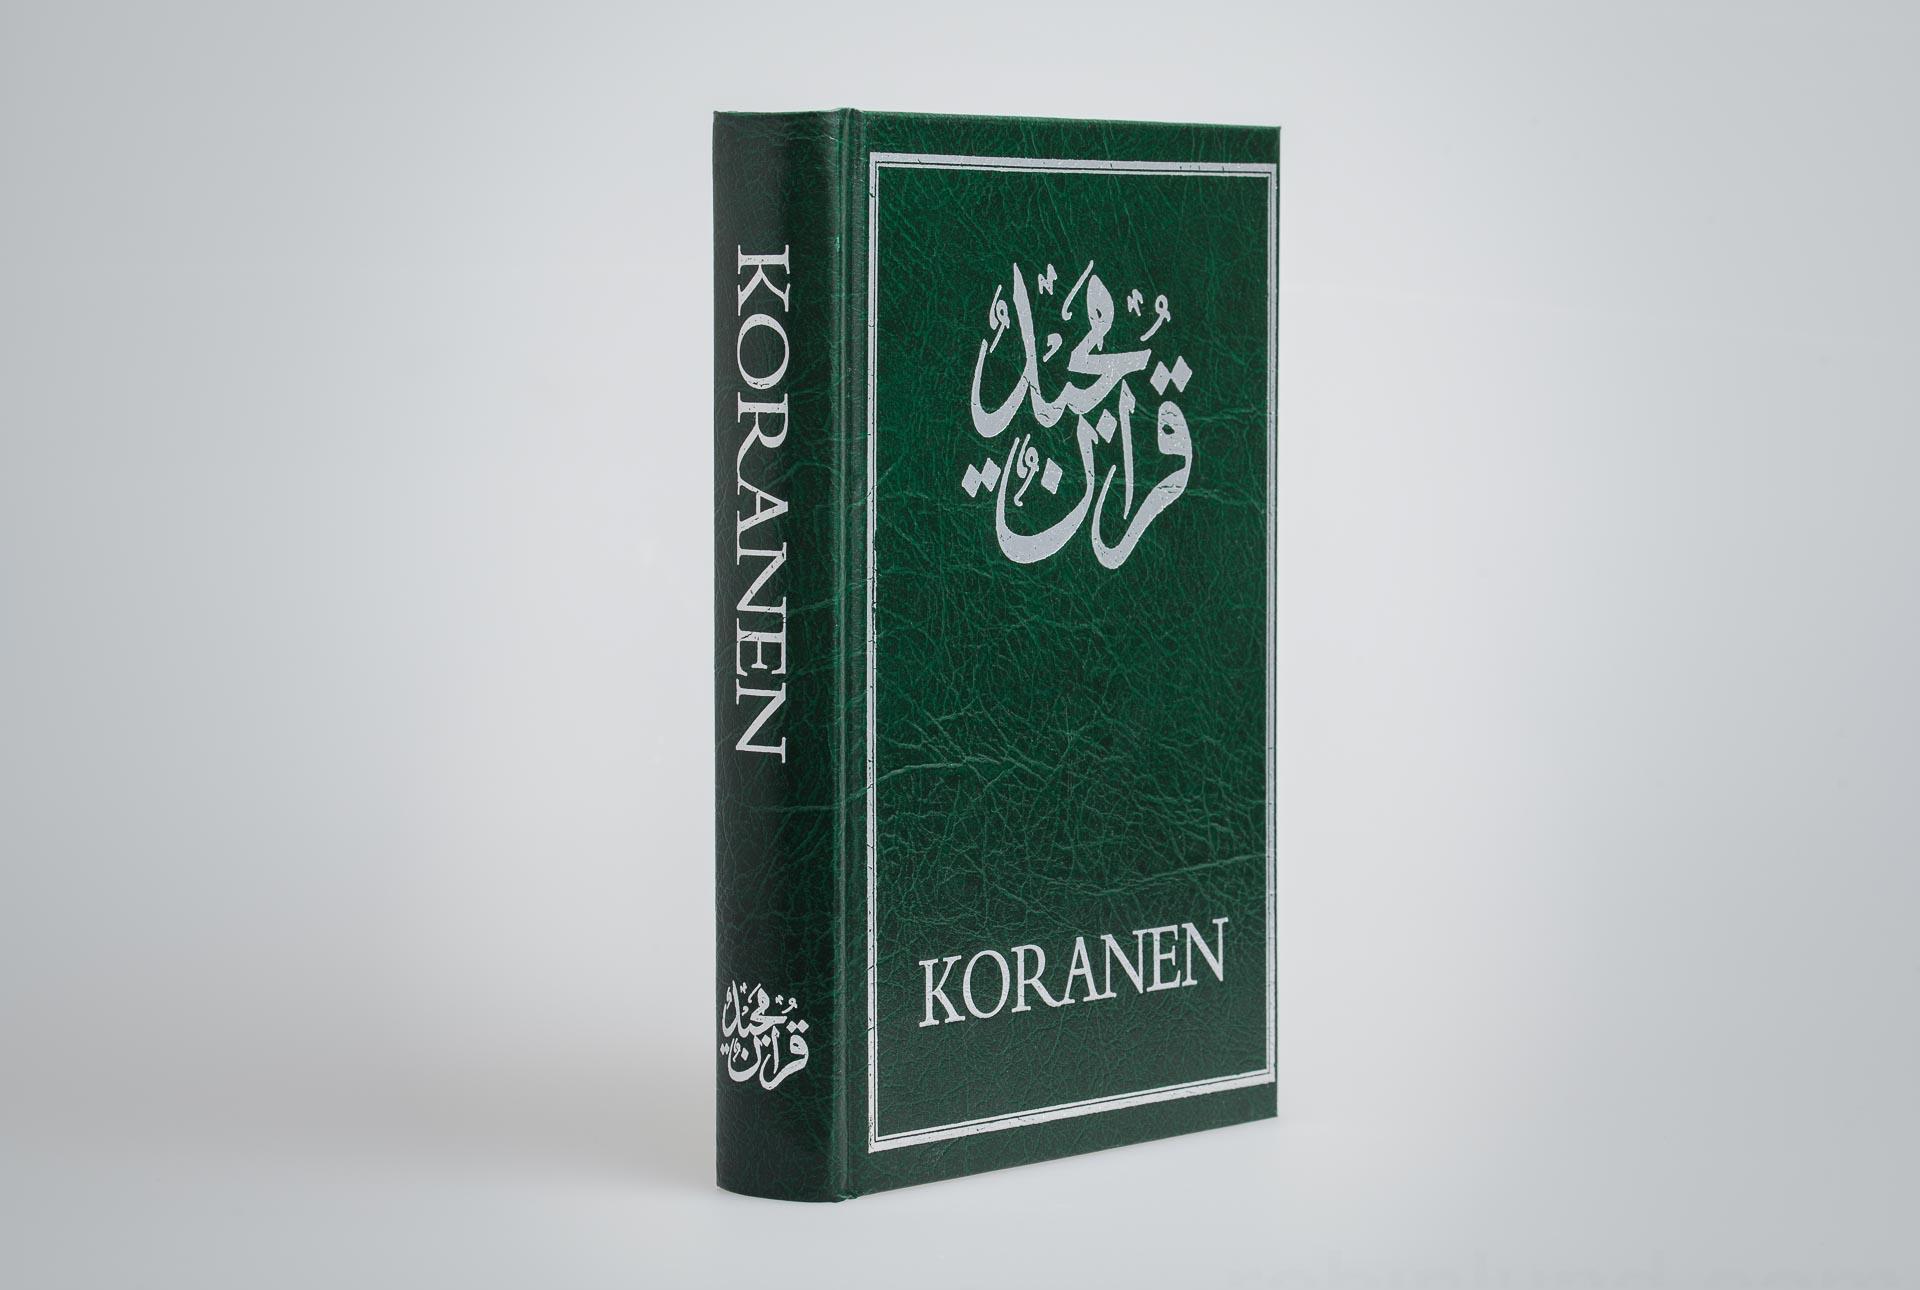 Norsk koran